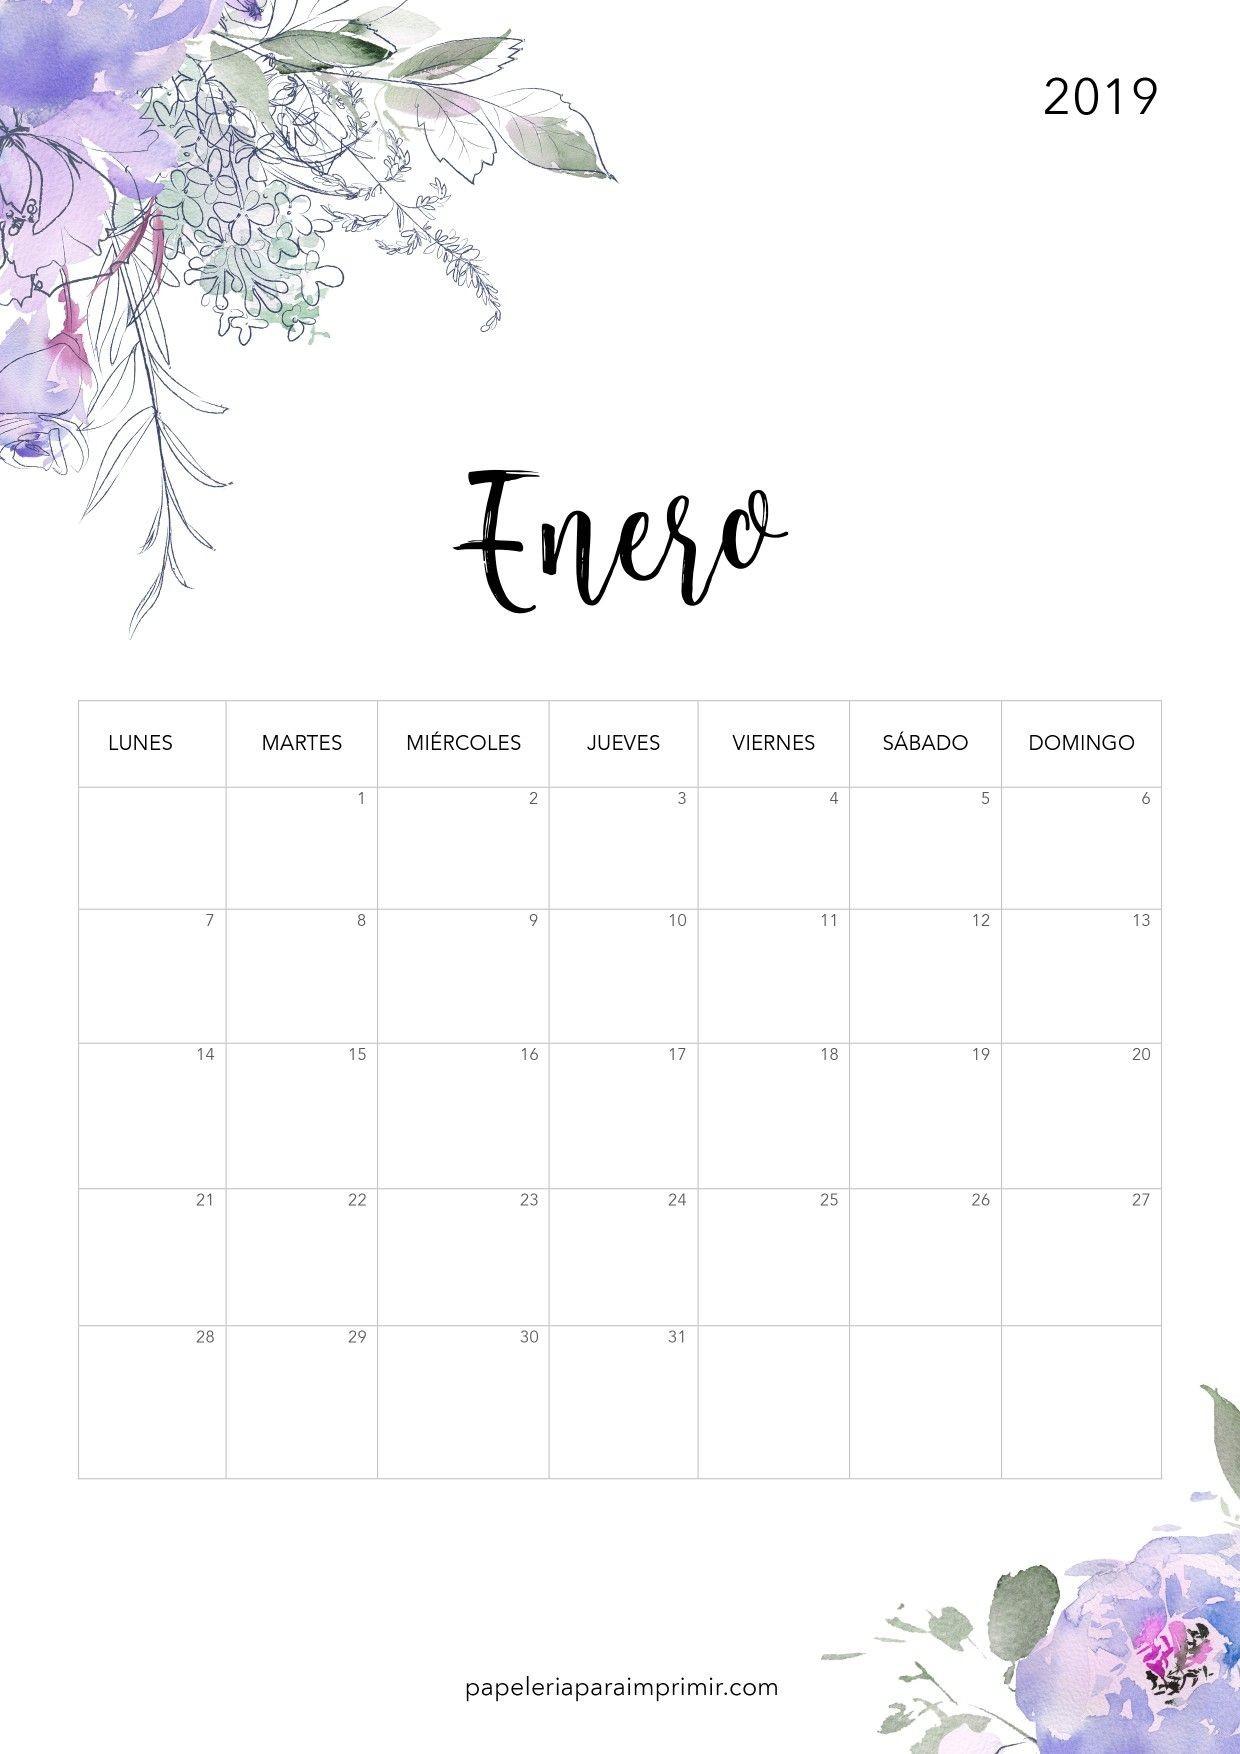 Imprimir Calendario De Marzo 2019 Más Caliente Pin De Mara En Calendario Of Imprimir Calendario De Marzo 2019 Más Recientes January Calendar 2019 with Holidays January2019 January